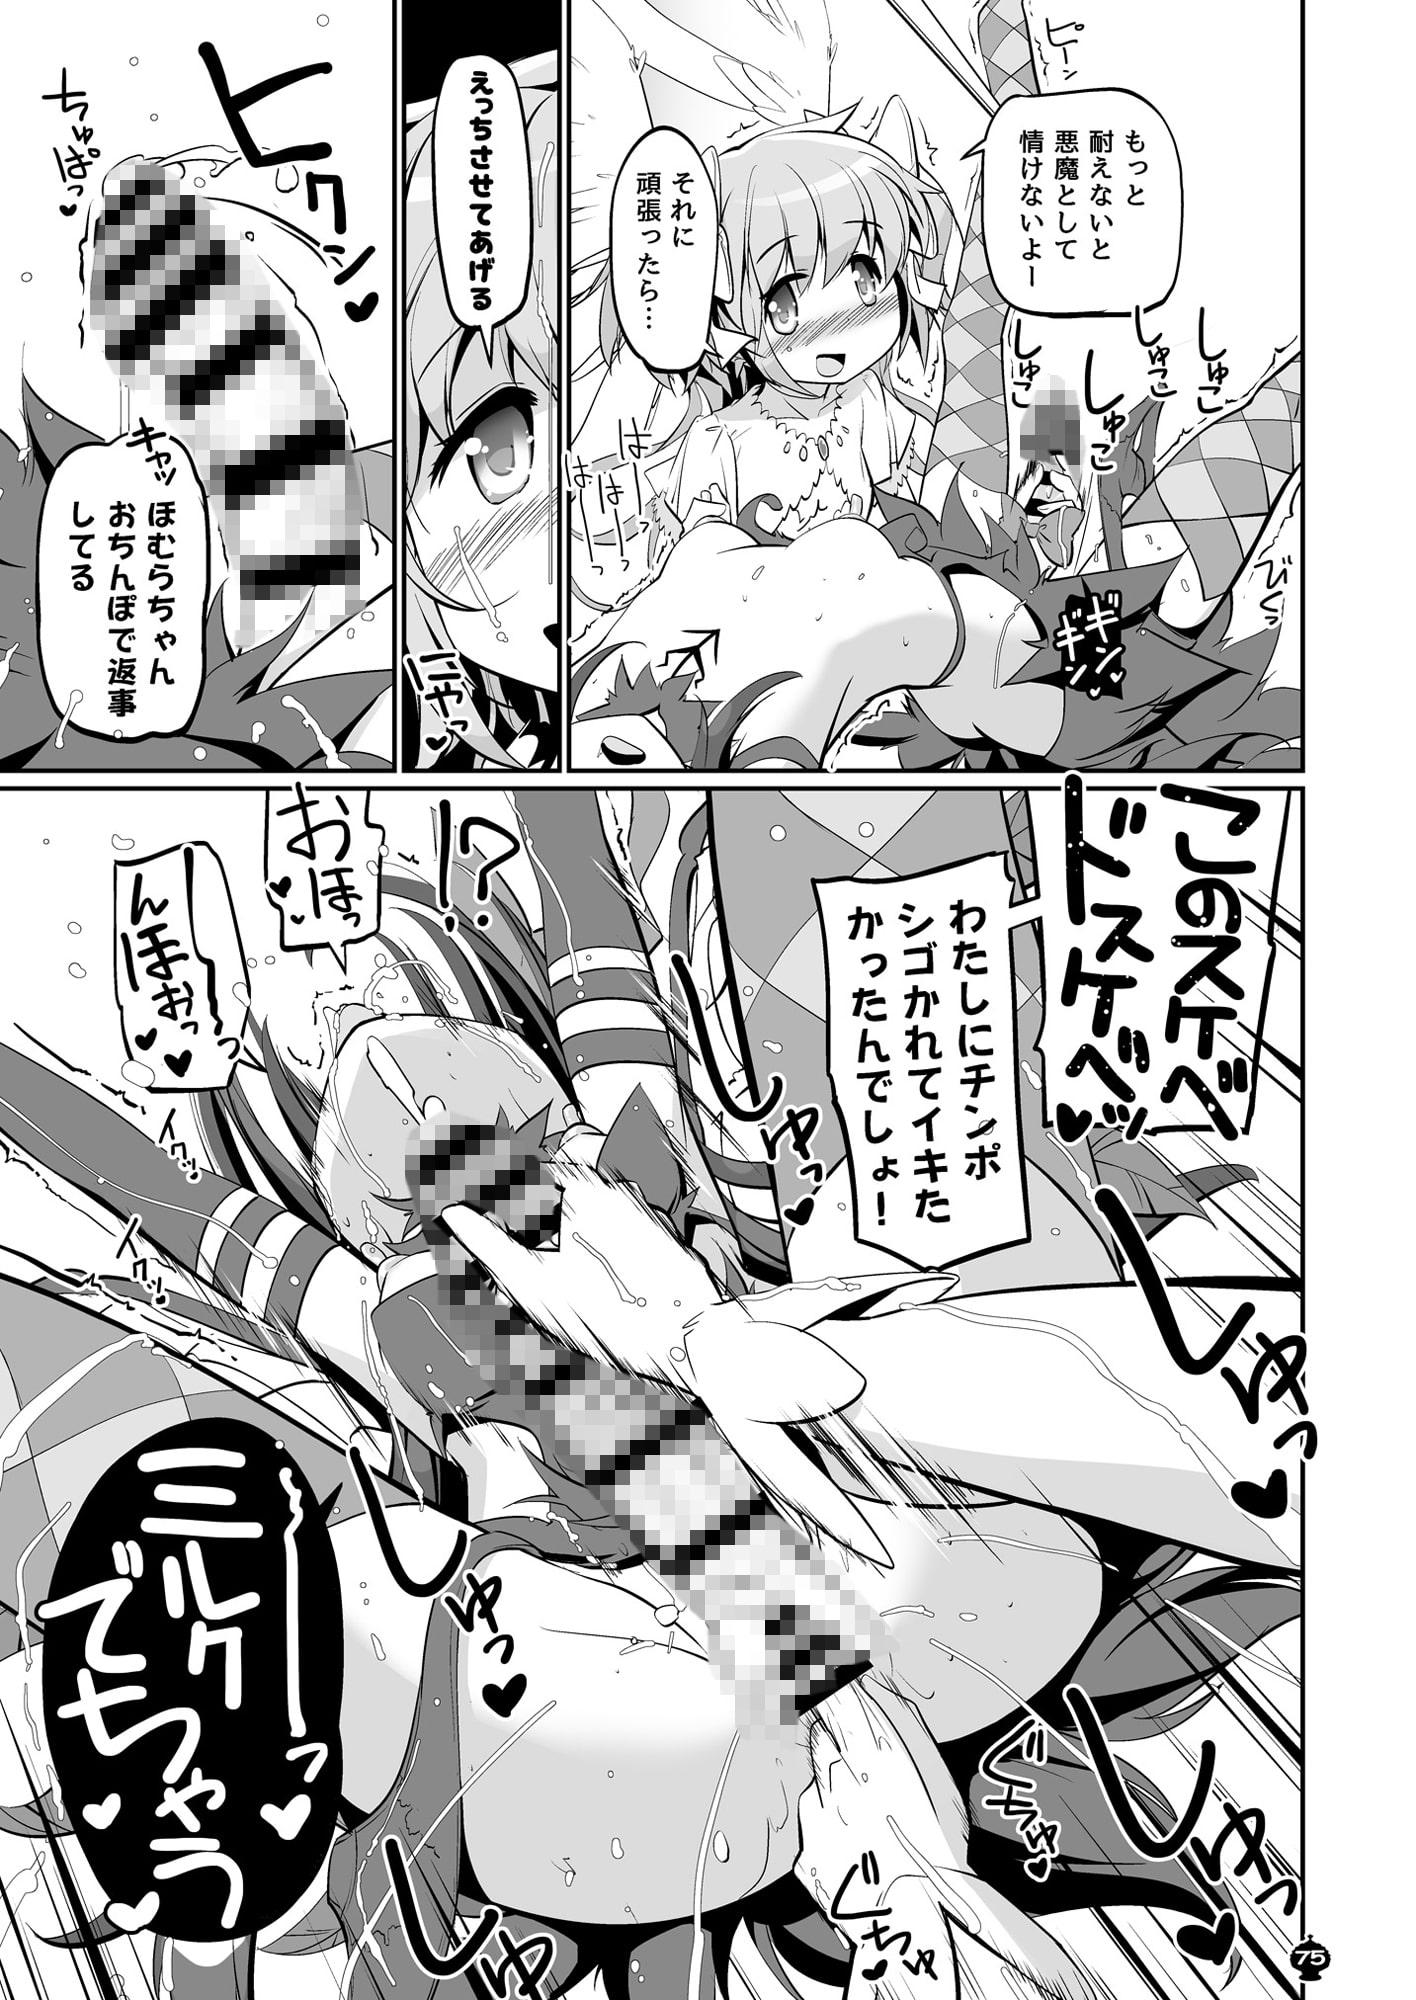 DEVILISH ULTIMATE ―アル悪ふたなり総集編―